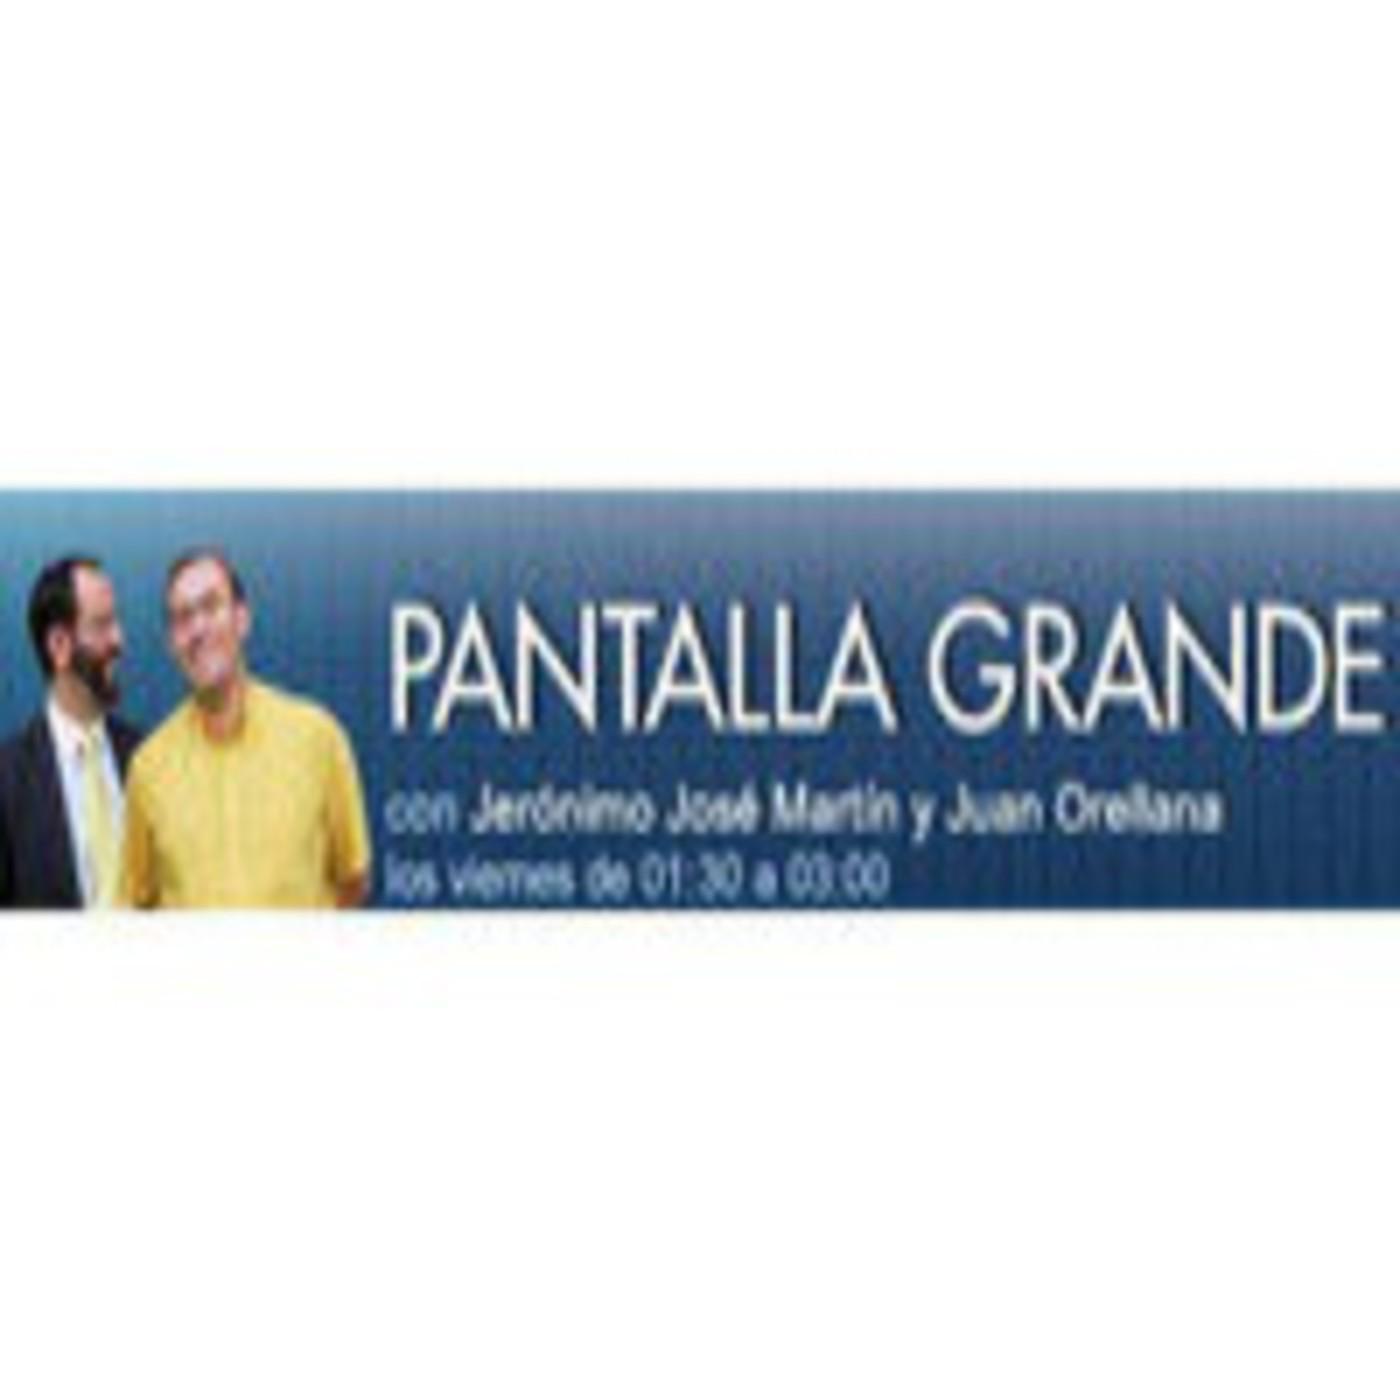 Pantalla Grande